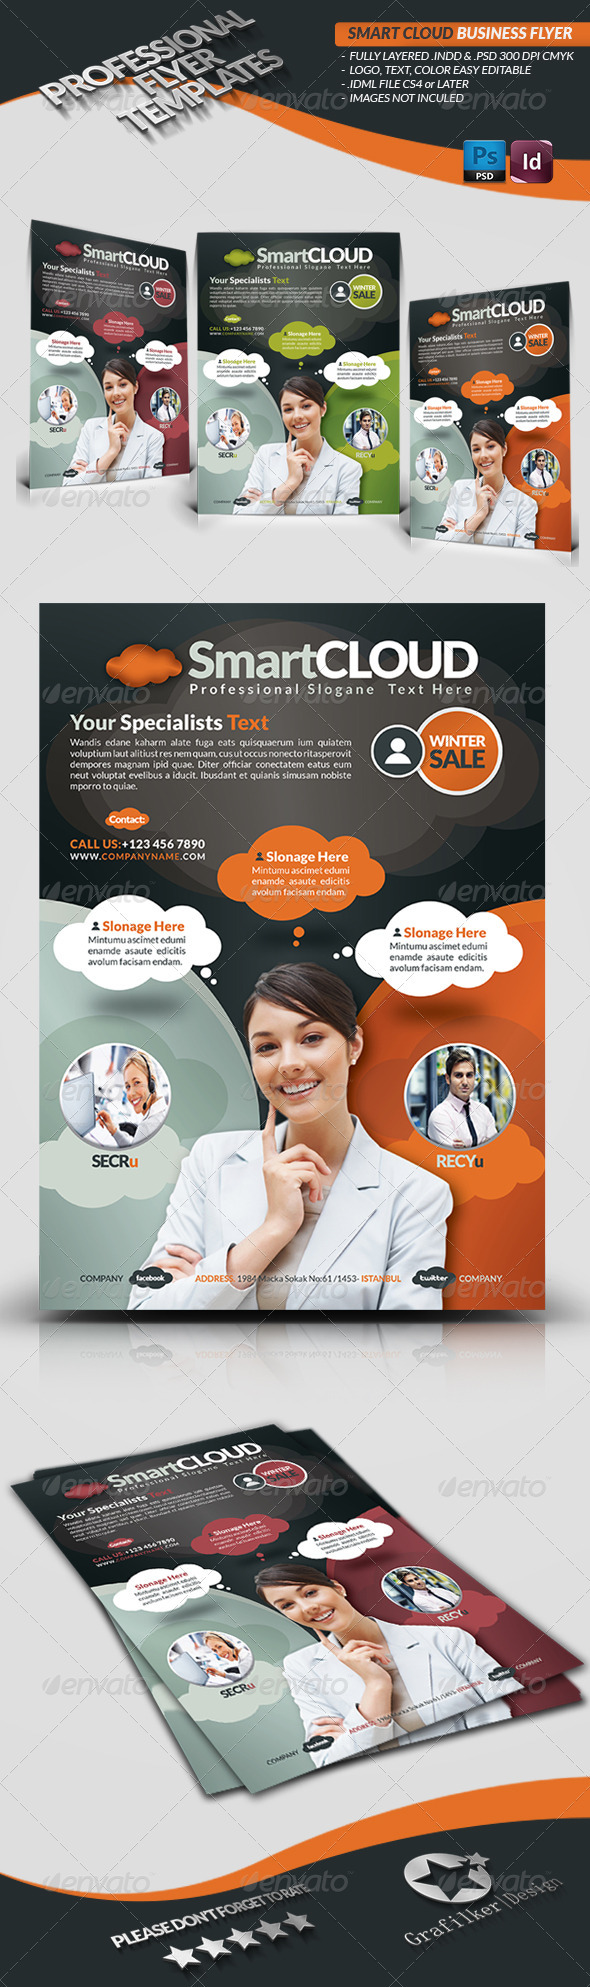 GraphicRiver Smart Cloud Business Flyer 3737082